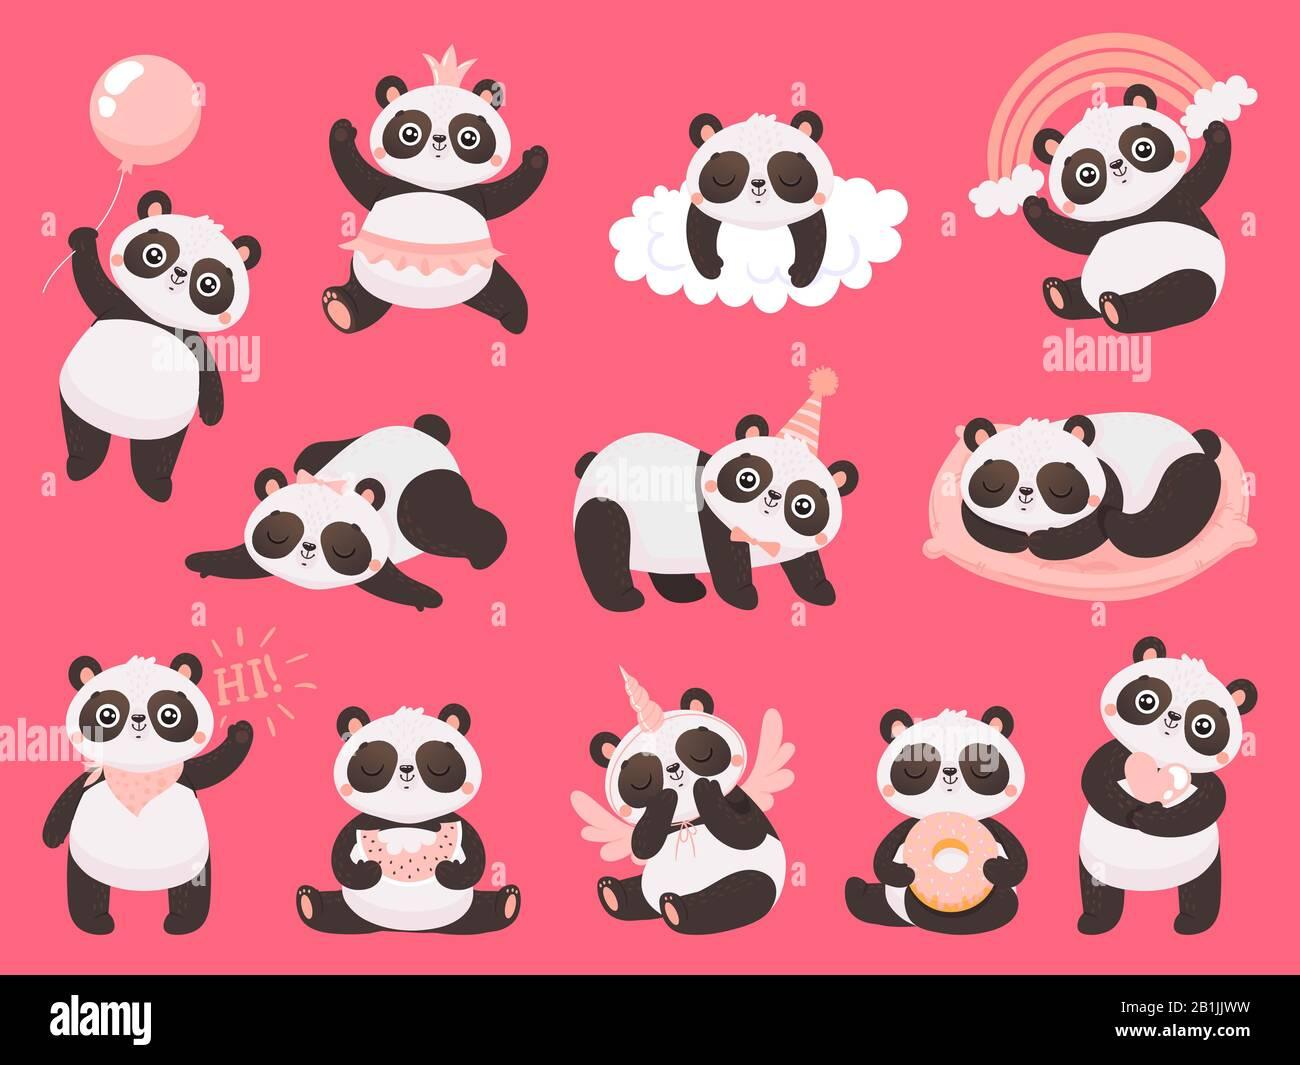 Cartoon Cute Panda Little Baby Pandas Adorable Sleeping Animals And Pink Princess Panda Bear Vector Illustration Set Stock Vector Image Art Alamy